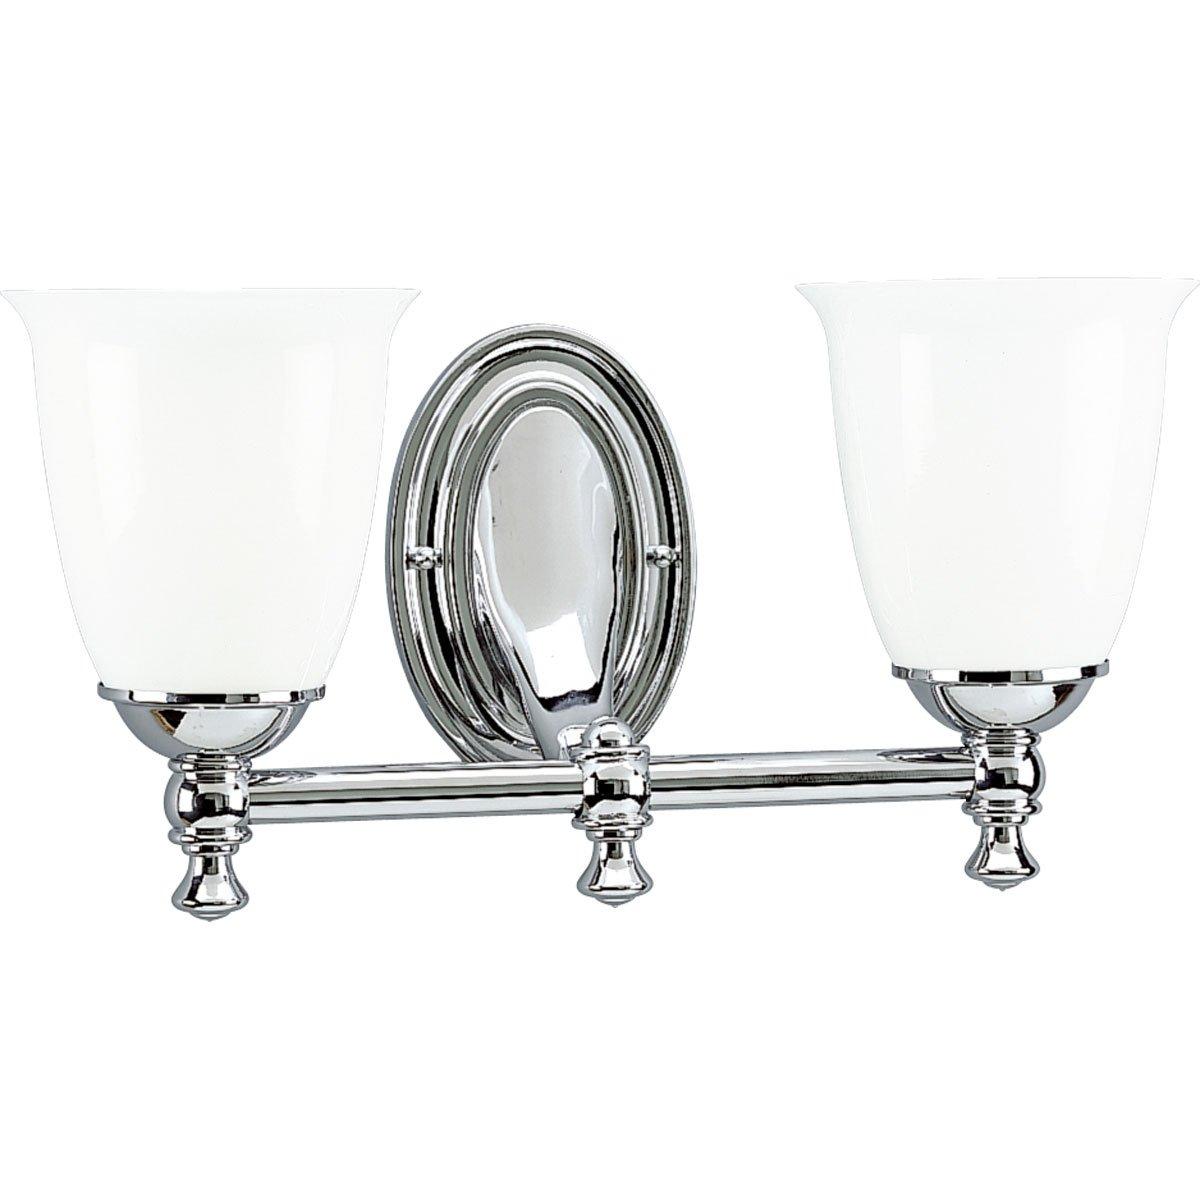 Progress Lighting P3028 15 2 Light Bath Bracket With White Opal Glass Polished Chrome Wall Sconces Amazon Com